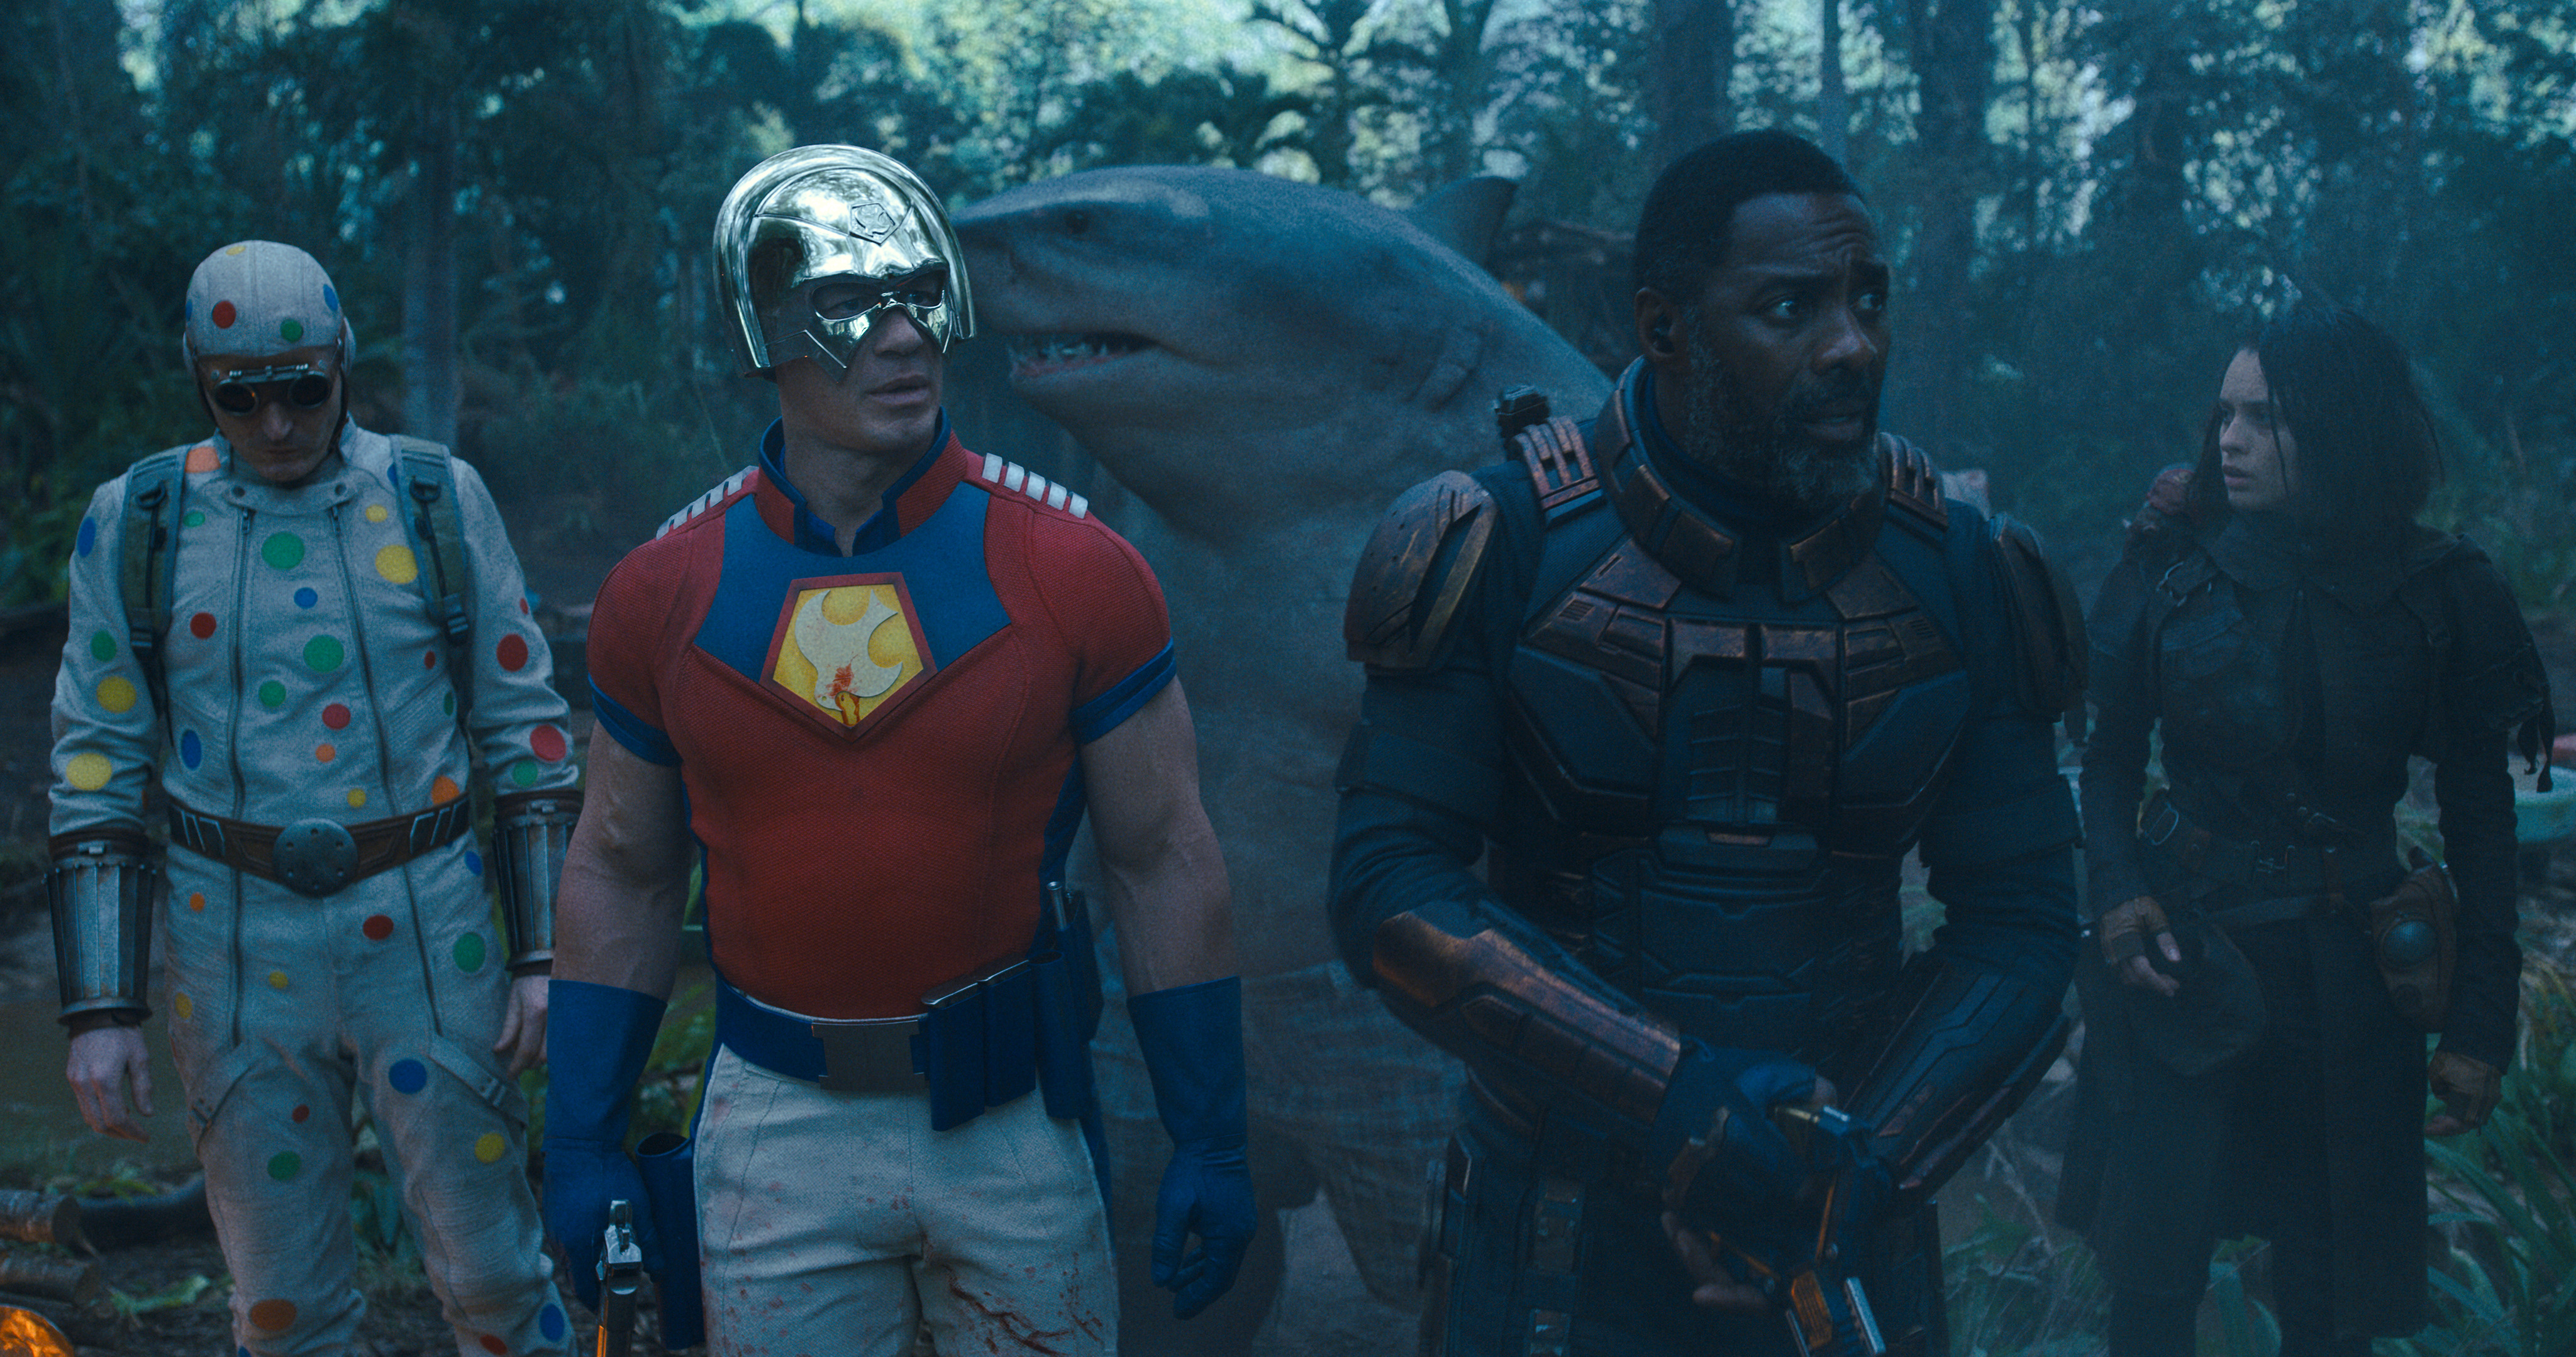 'The Suicide Squad' Movie Costume Breakdown: Photos, Exclusive Details